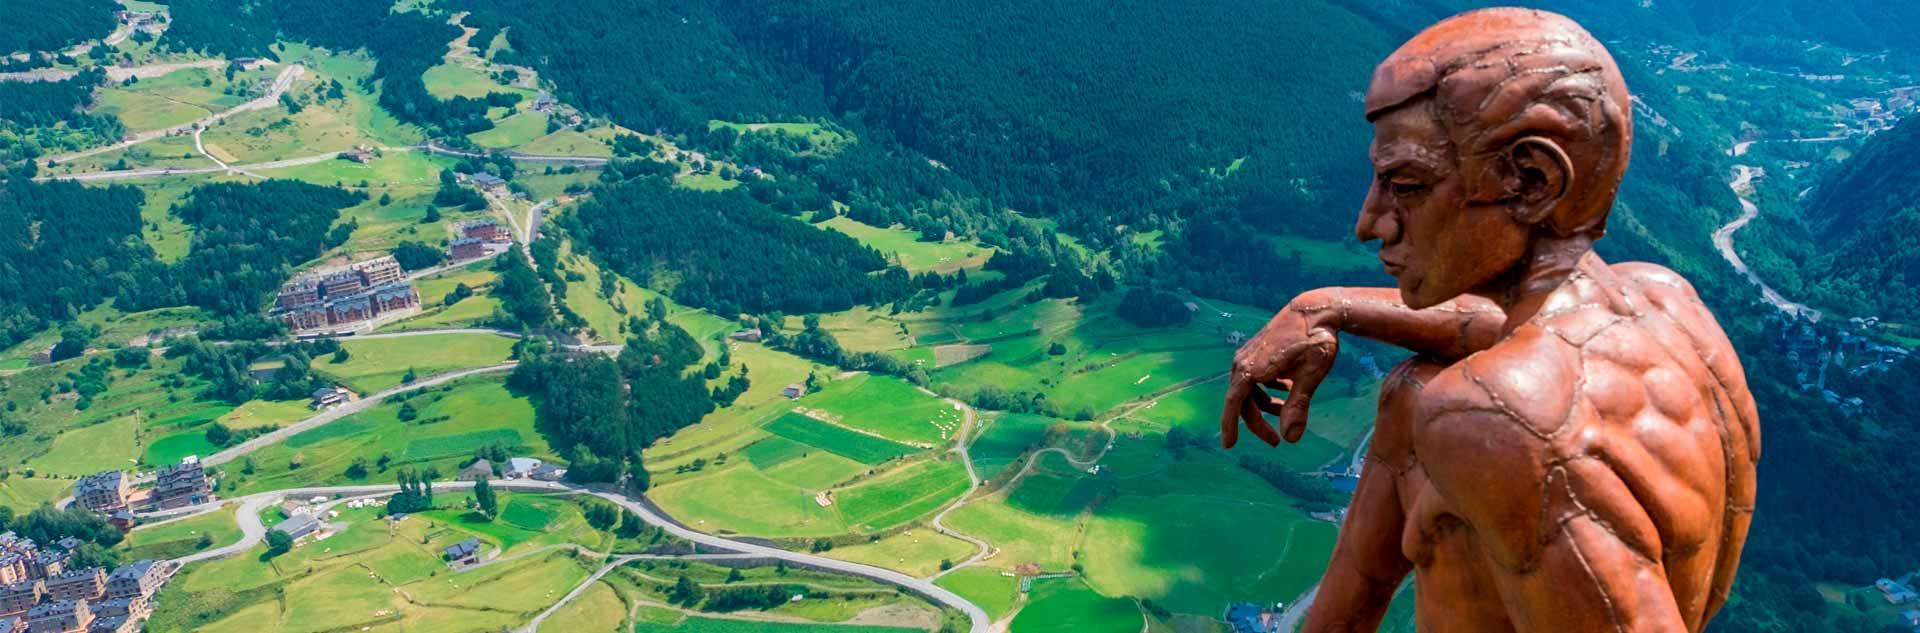 Roc del Quer en Andorra